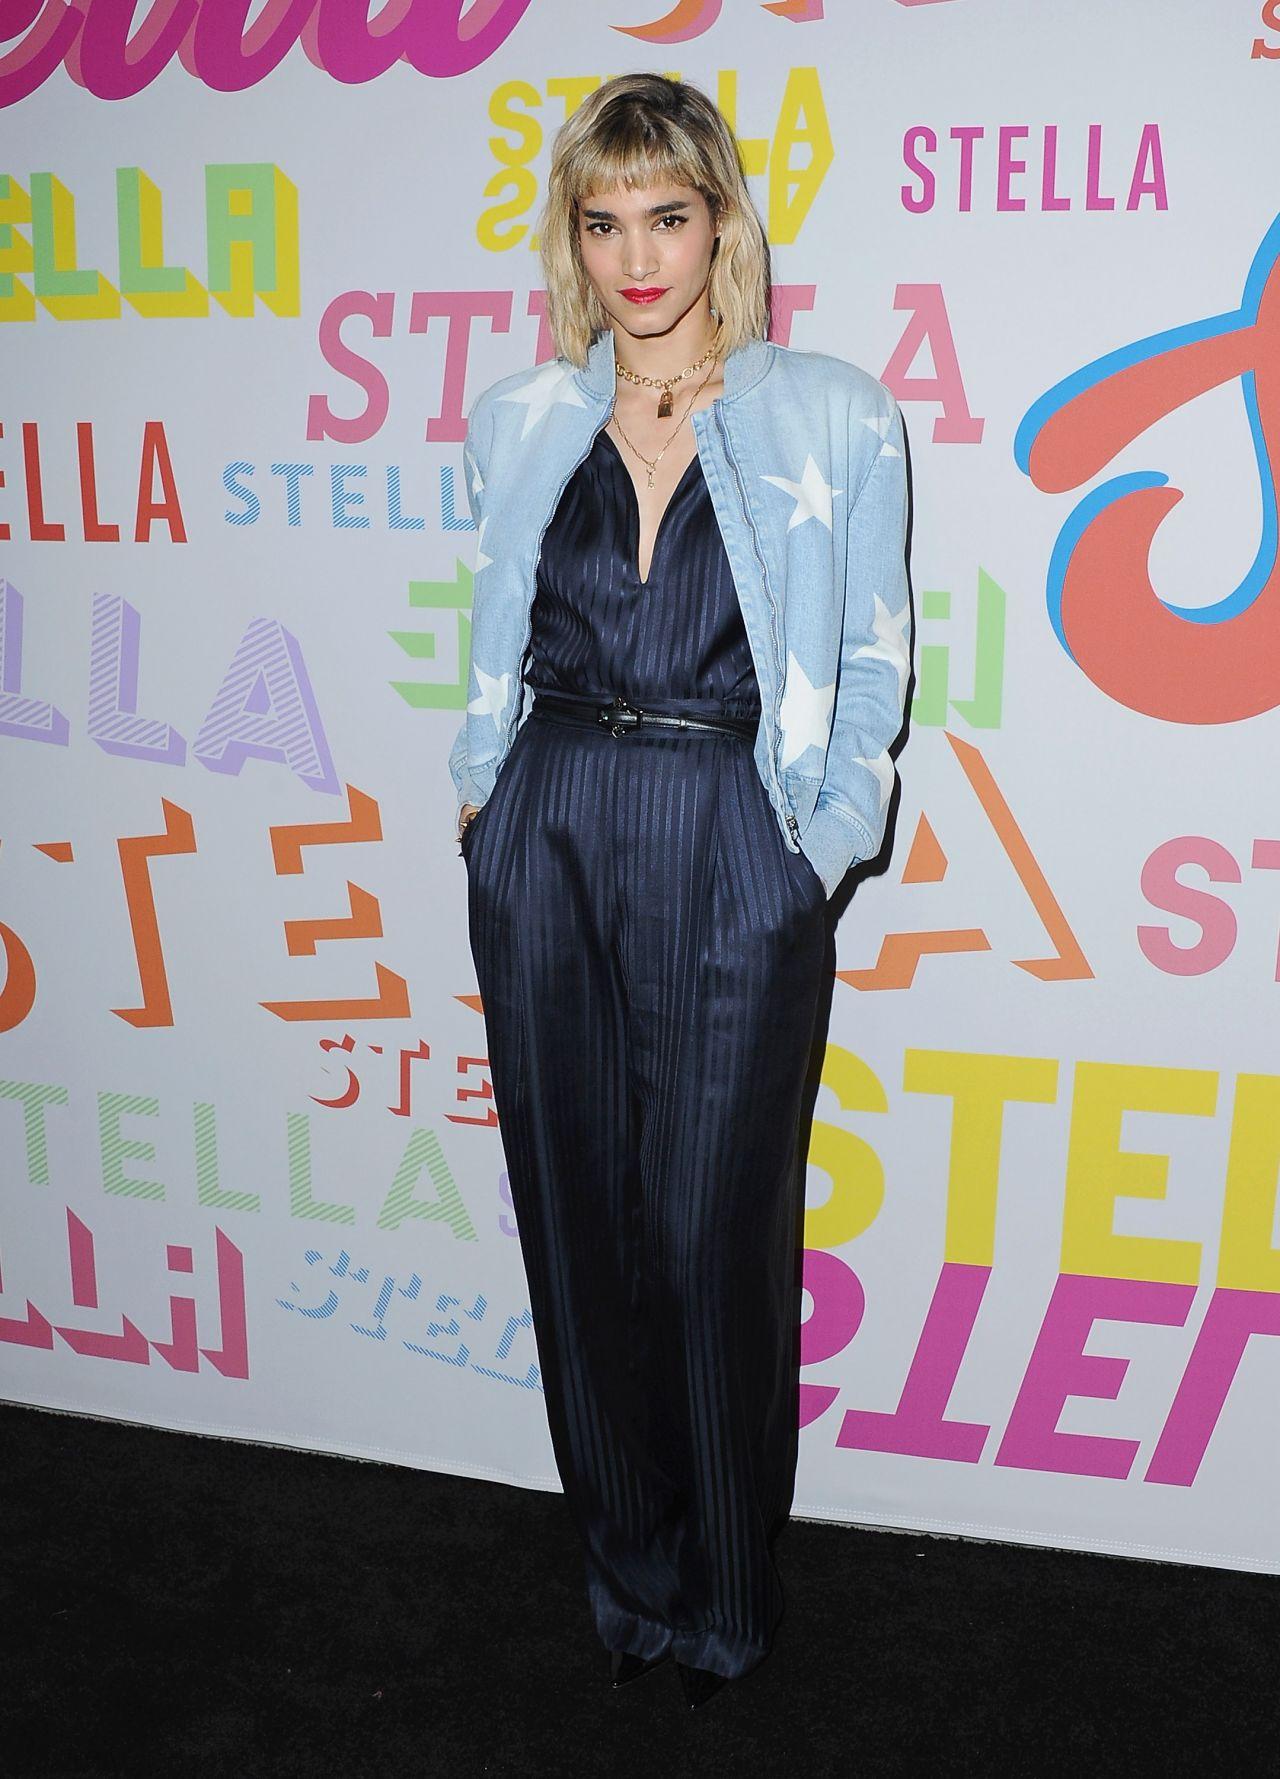 http://celebmafia.com/wp-content/uploads/2018/01/sofia-boutella-stella-mccartney-show-in-hollywood-3.jpg